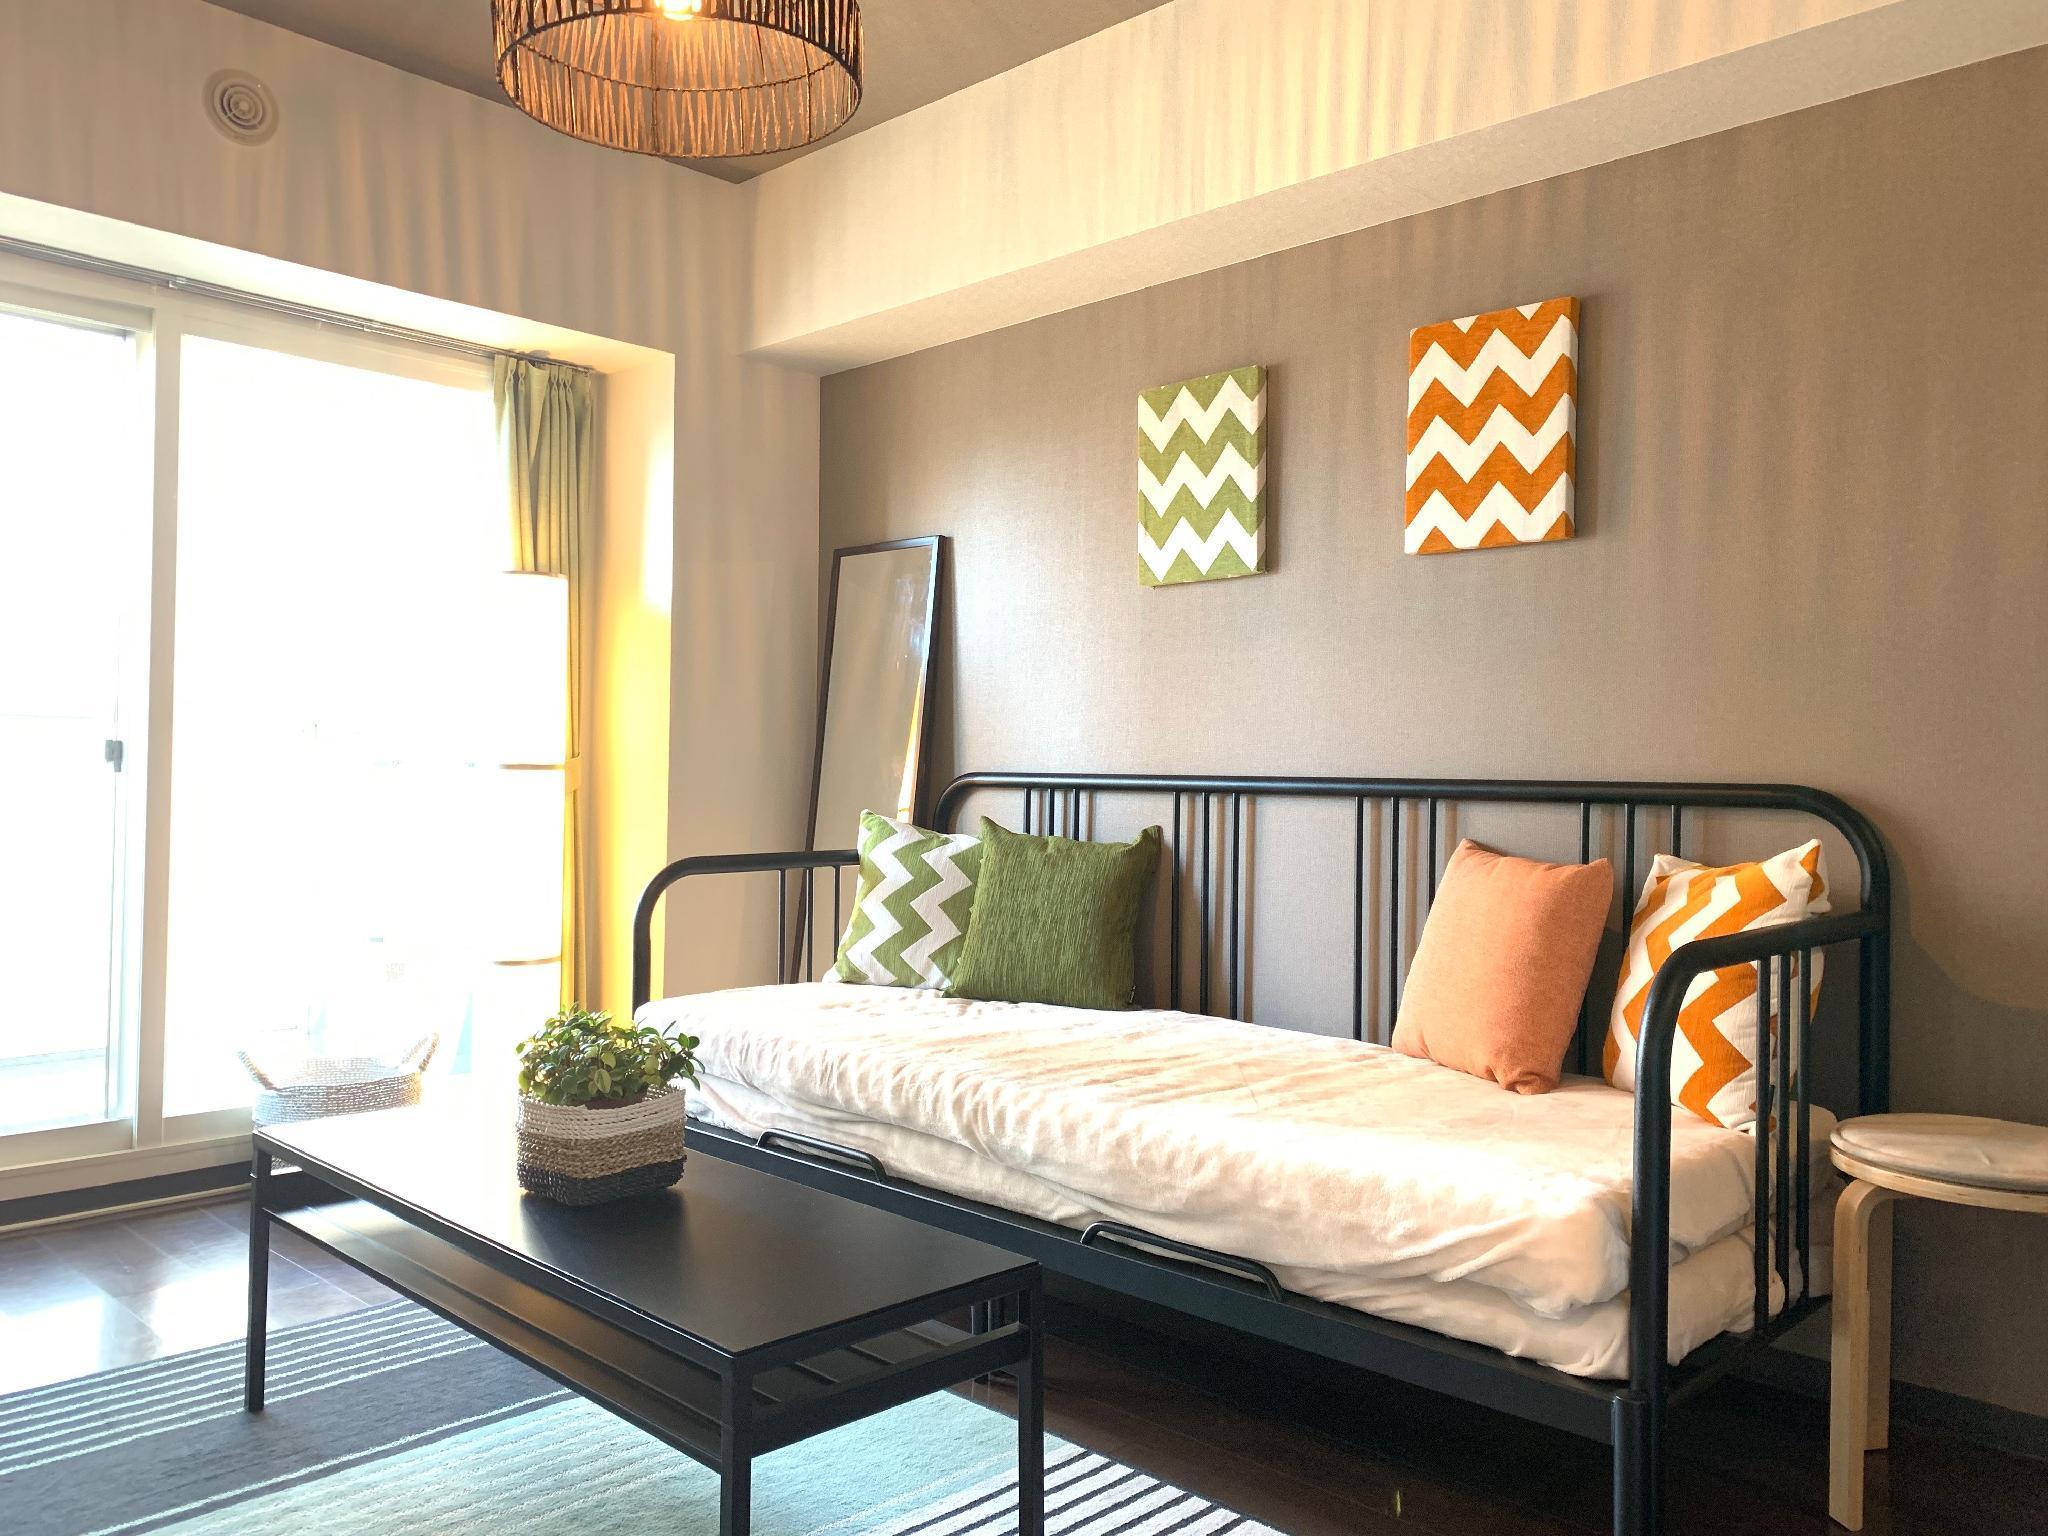 SO71 1 Bedroom Apartment In Sapporo